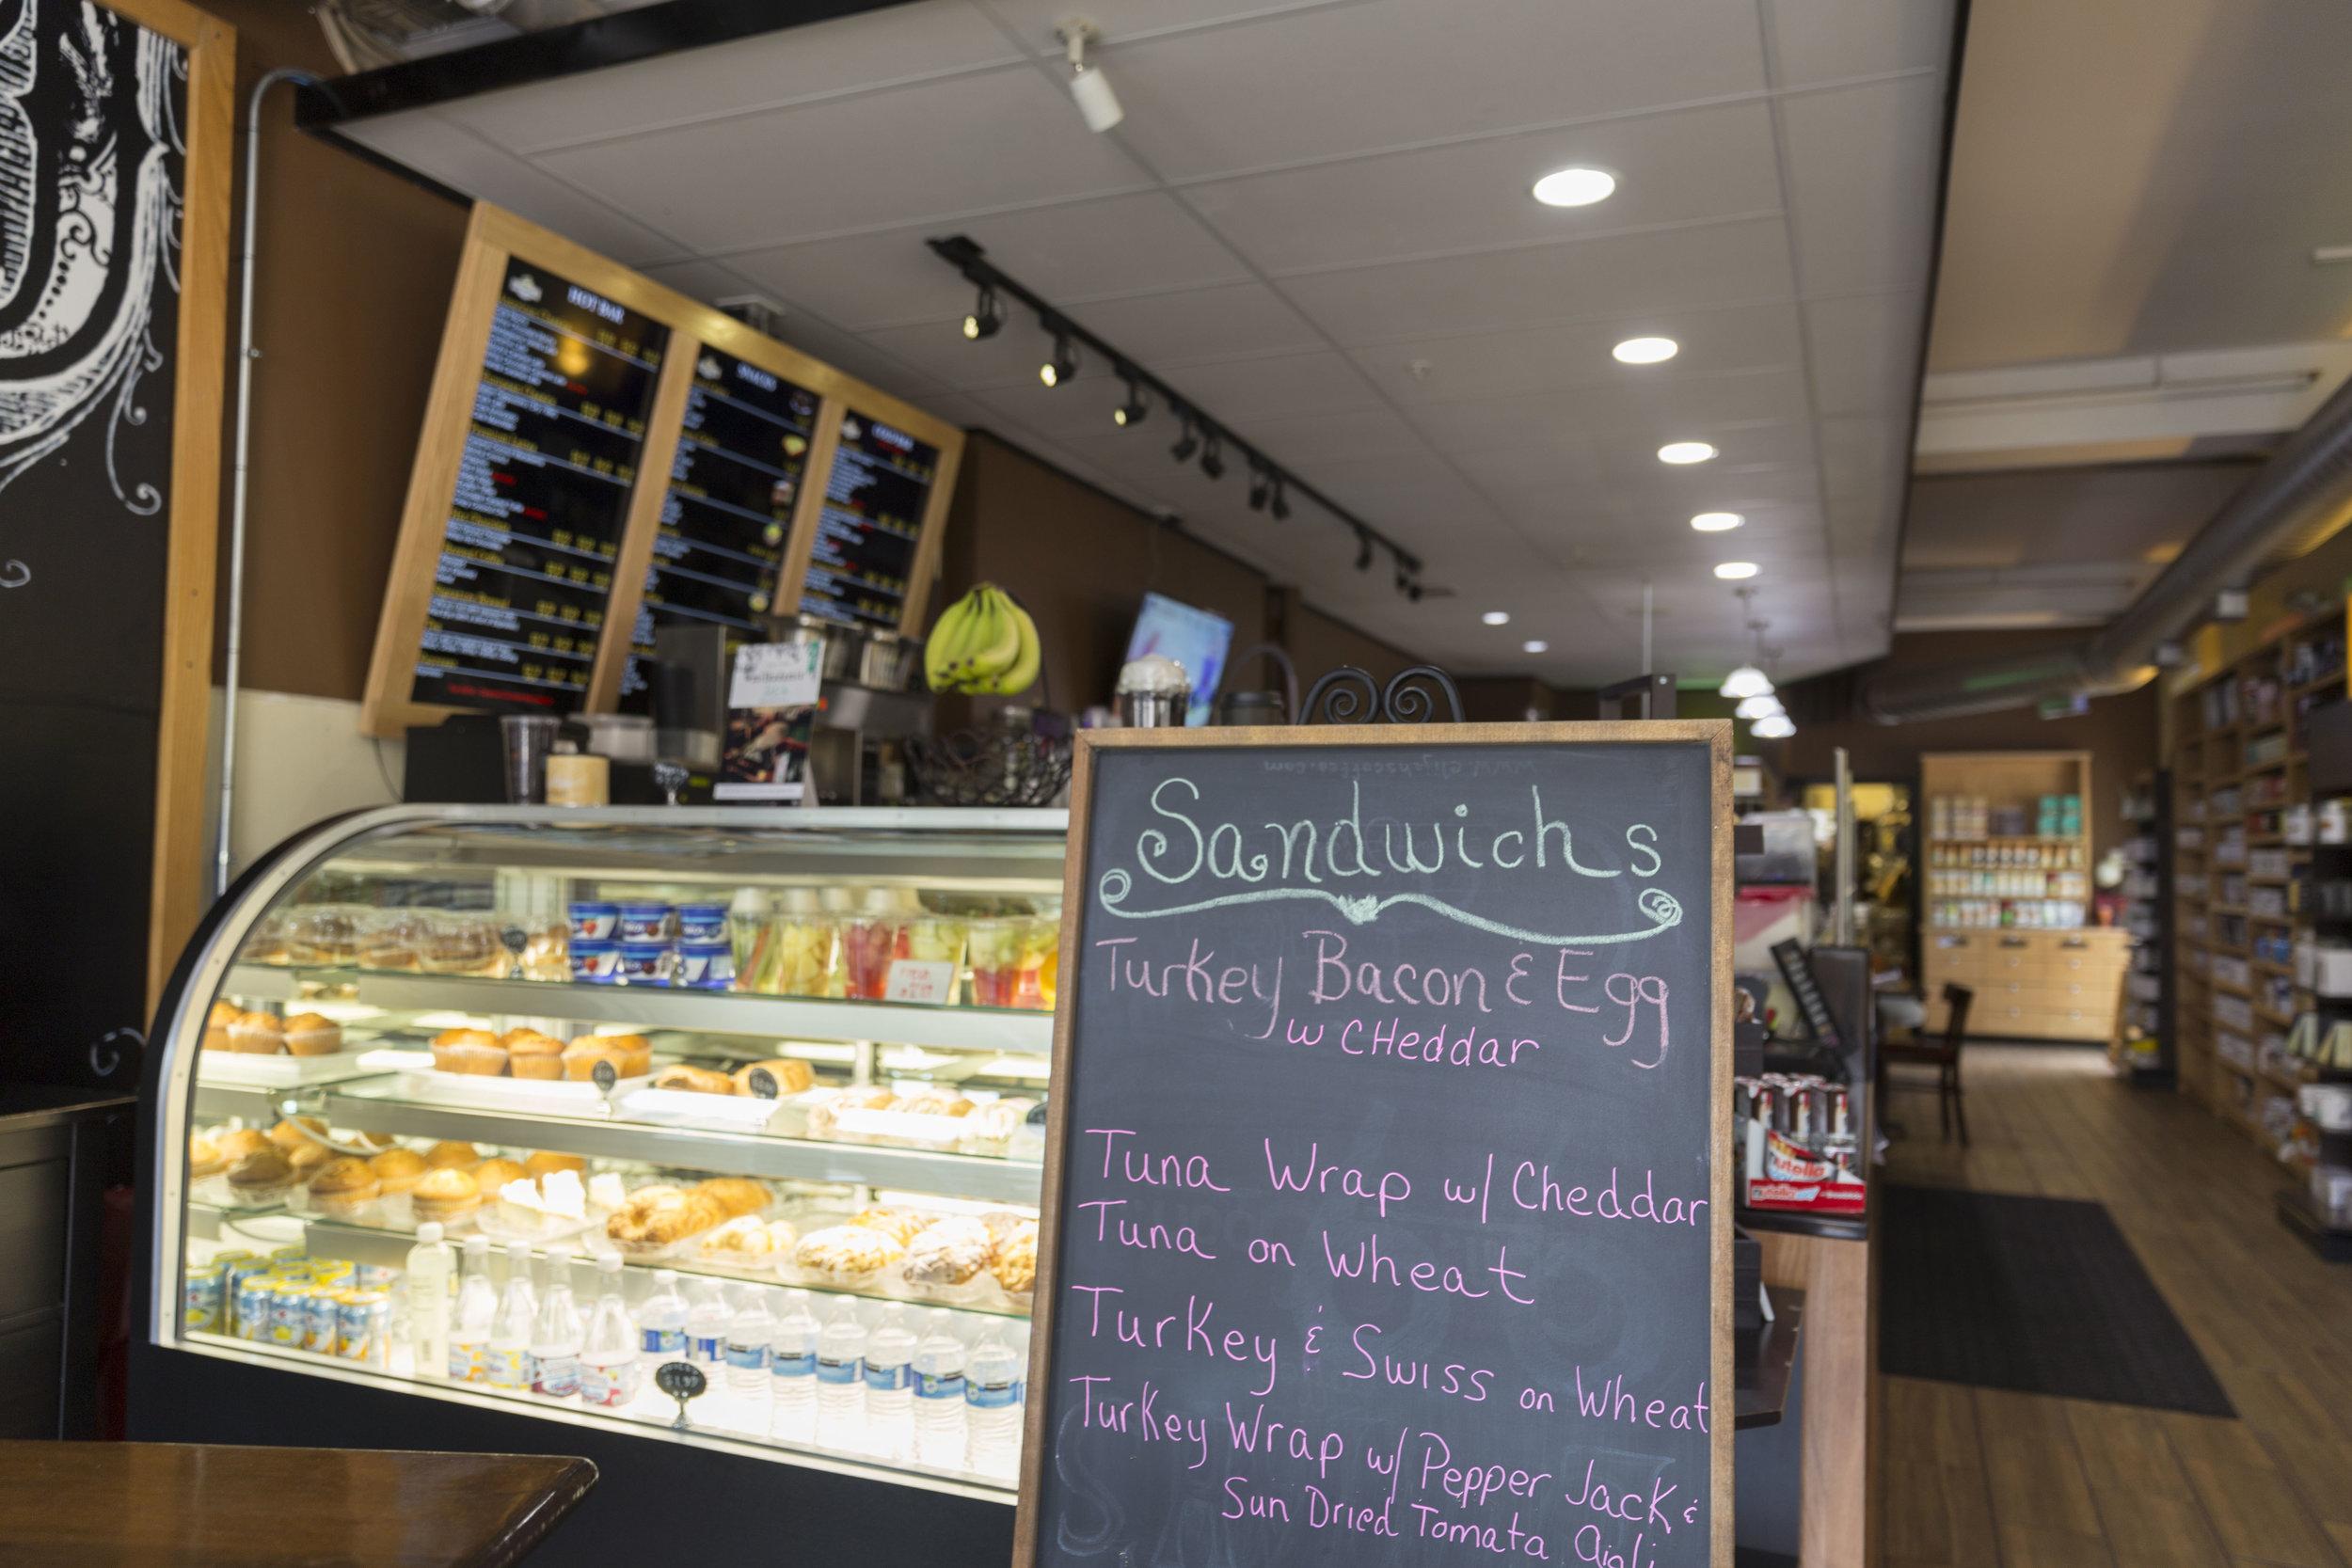 Photo by Marielle Decena   Gloria Jean's chalkboard menu advertises the various sandwich and breakfast options.